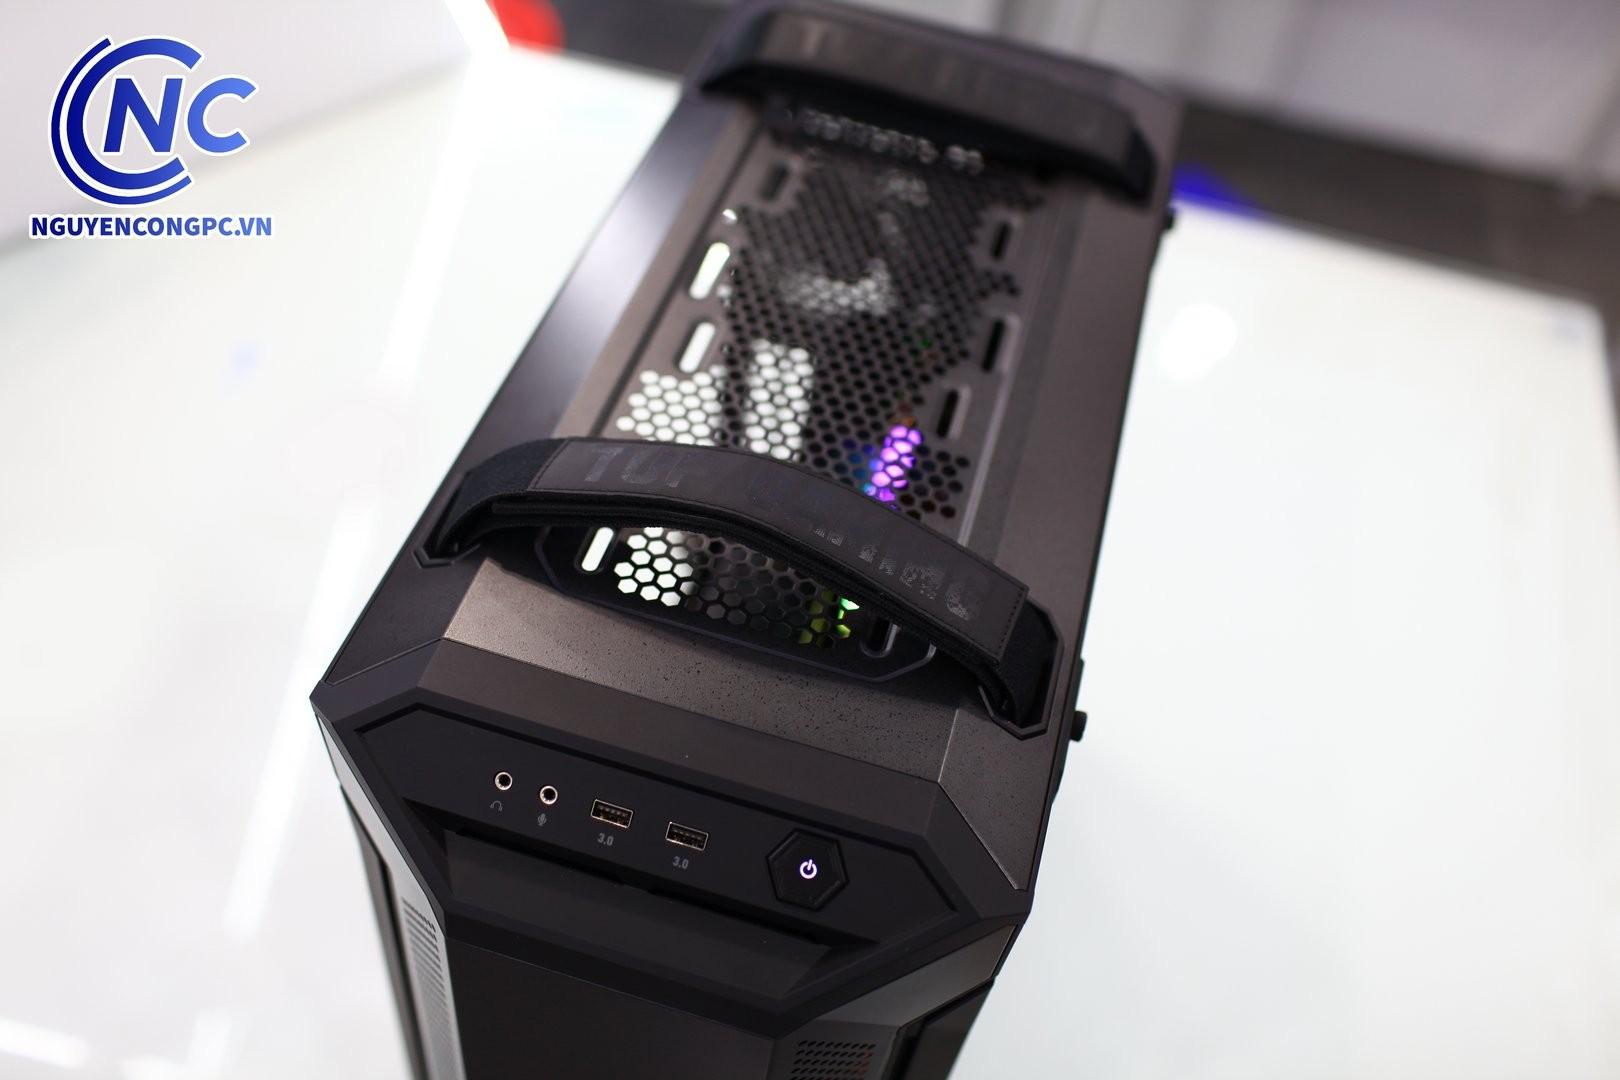 Asus TUF Gaming GT501 top